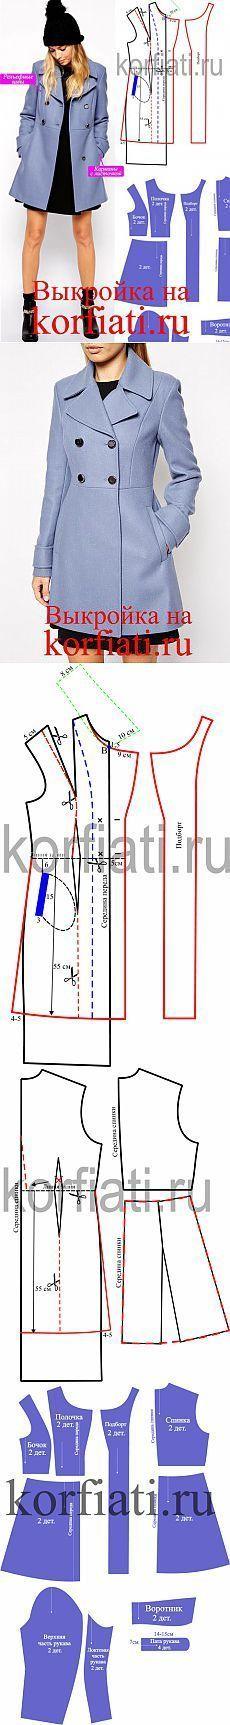 Patrón capa corta por A. Korfiati